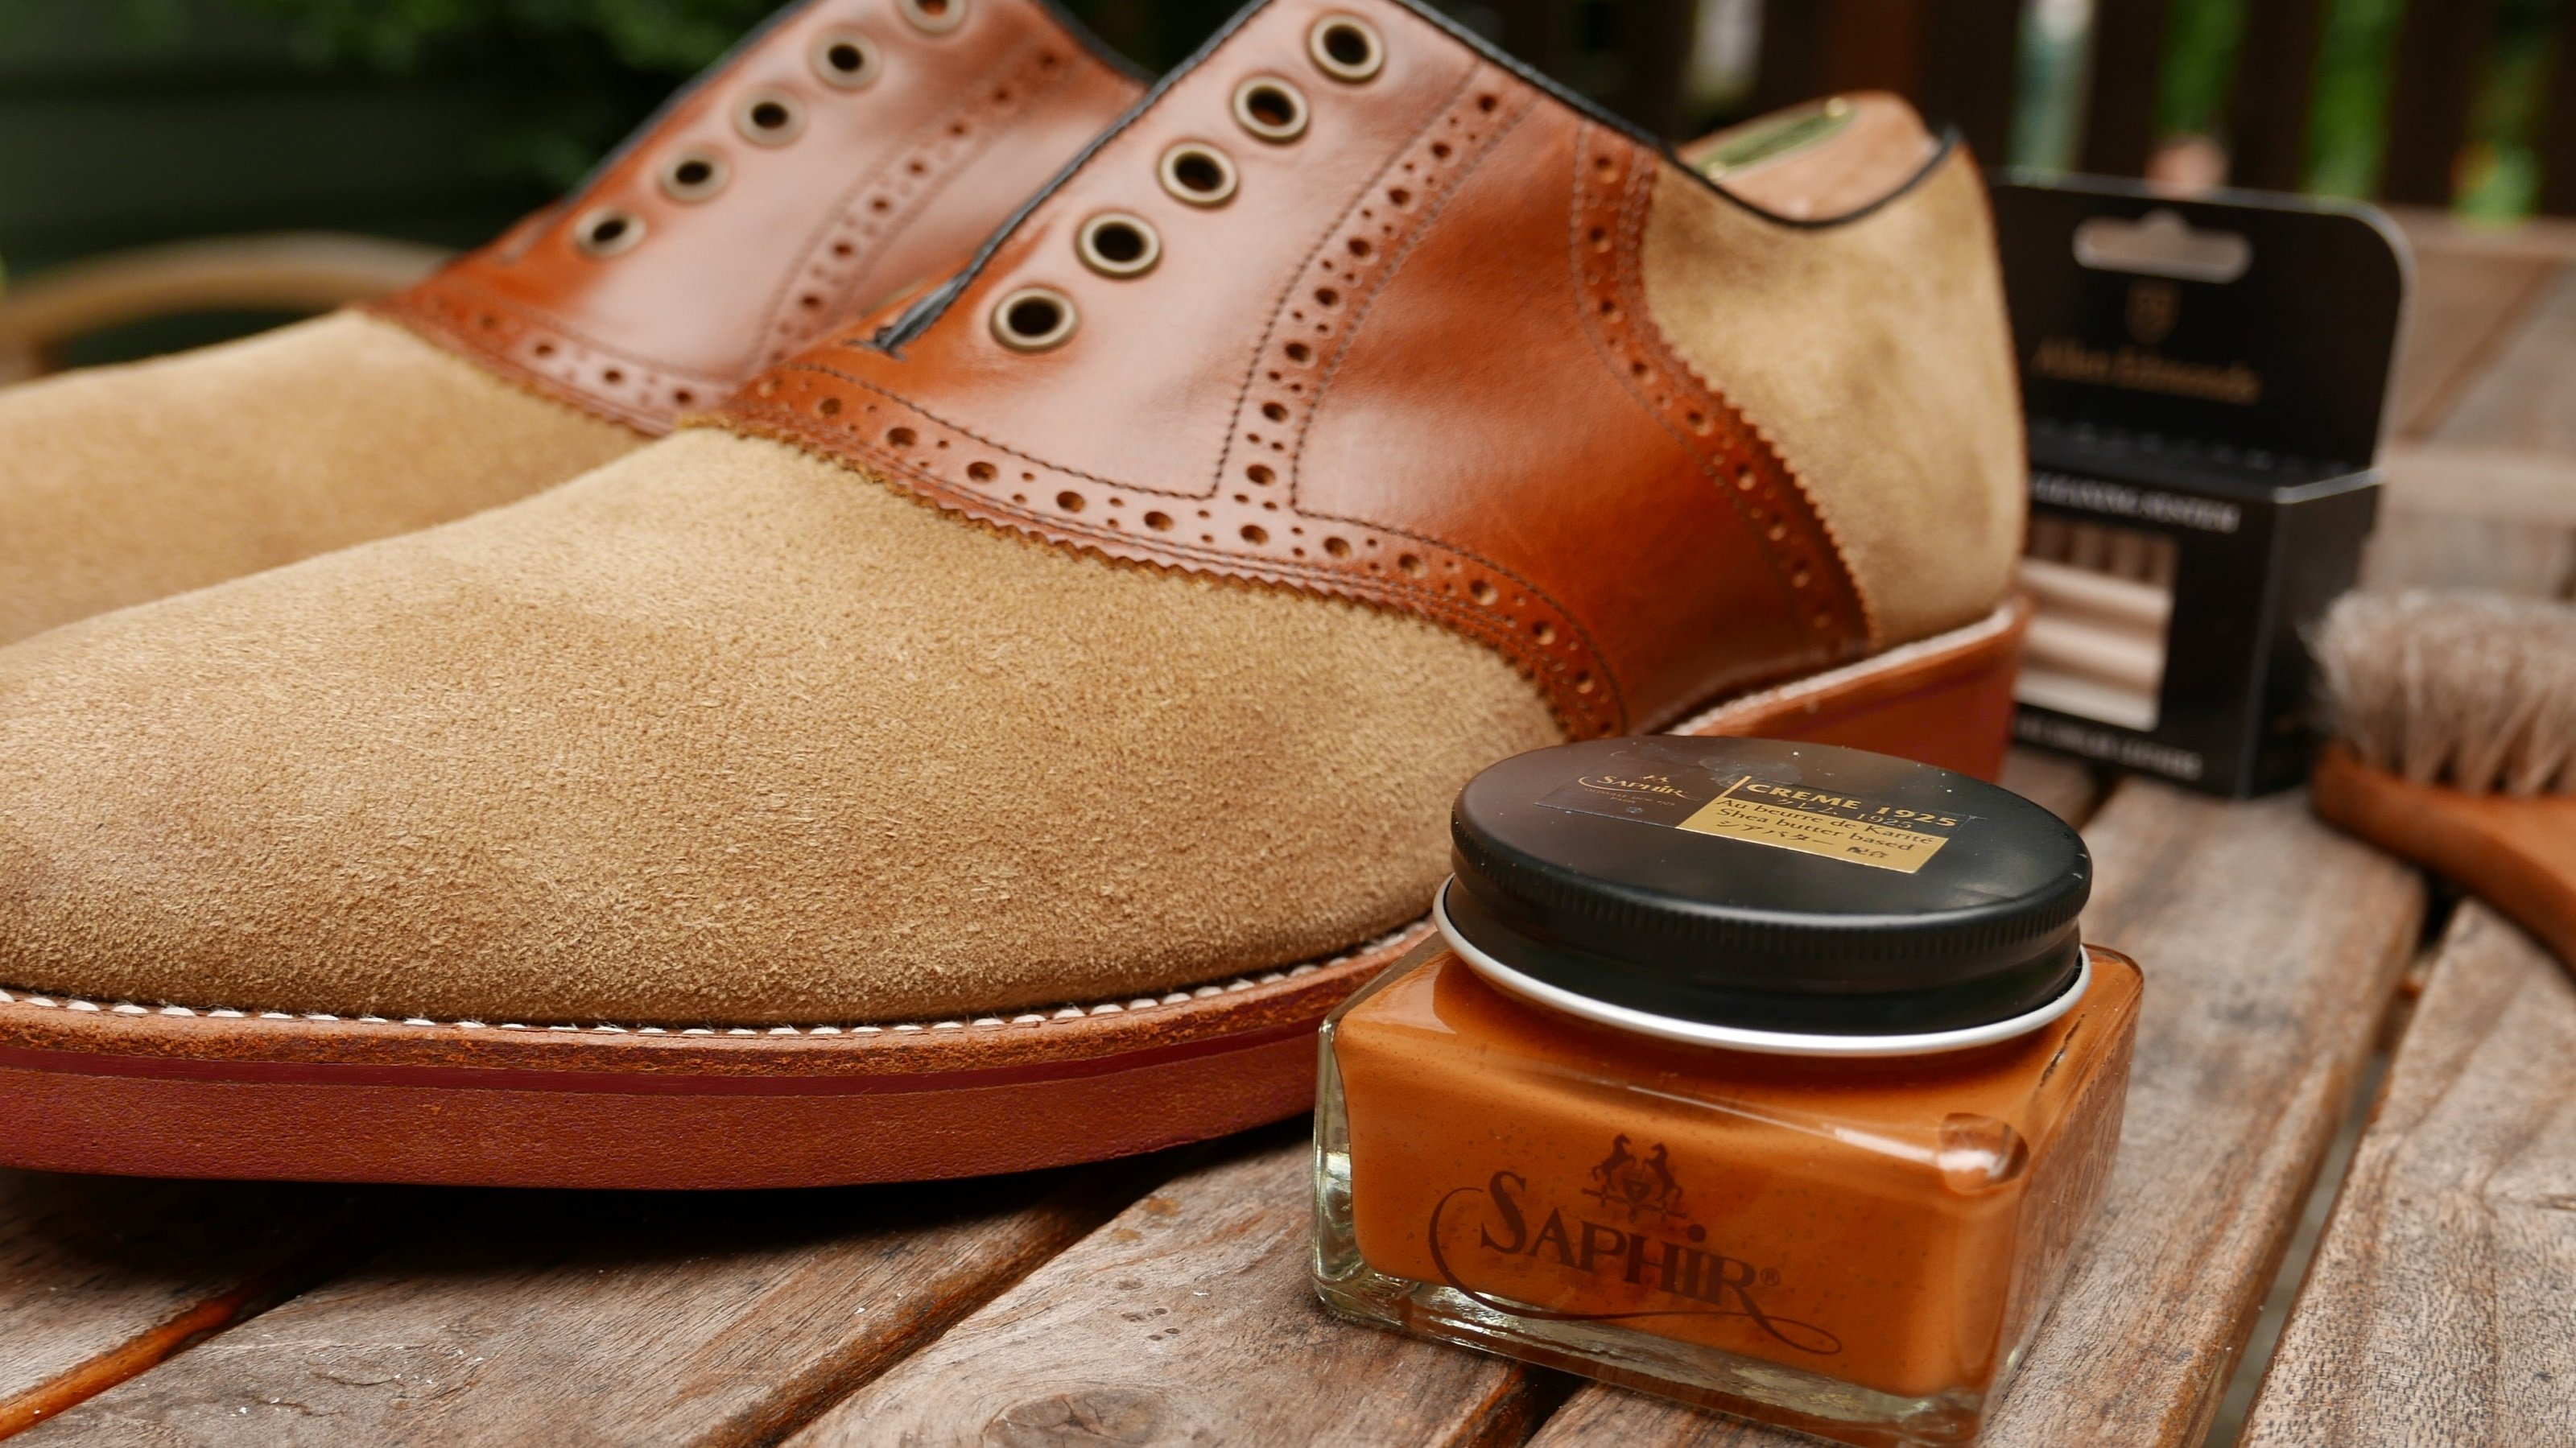 Saphir shoe cream